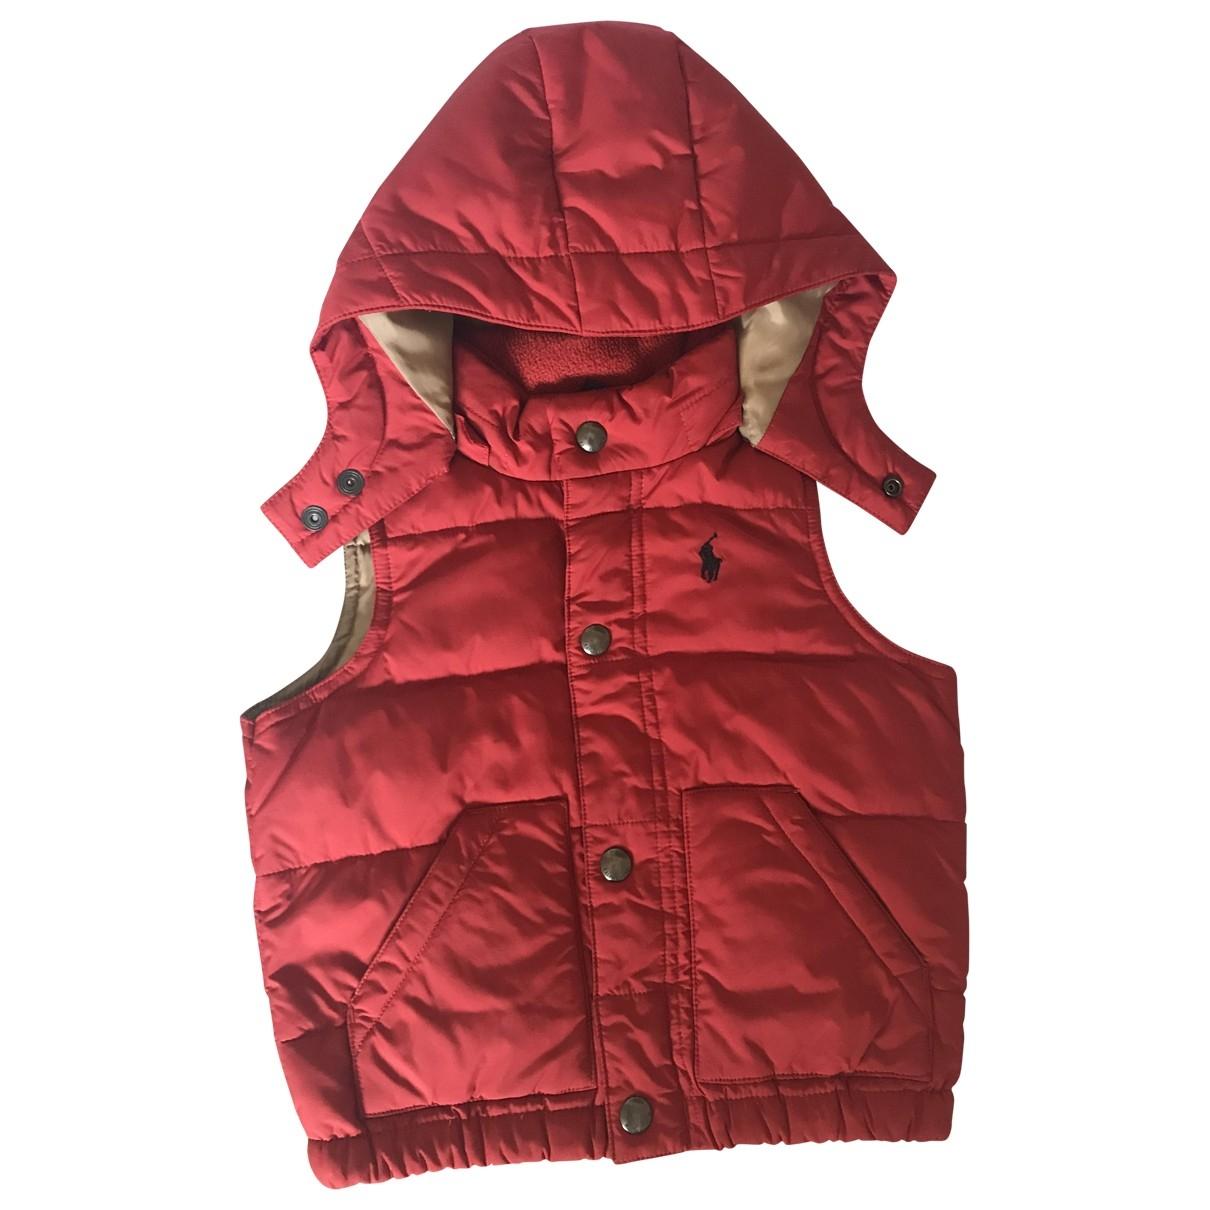 Polo Ralph Lauren \N Jacke, Maentel in  Rot Polyester